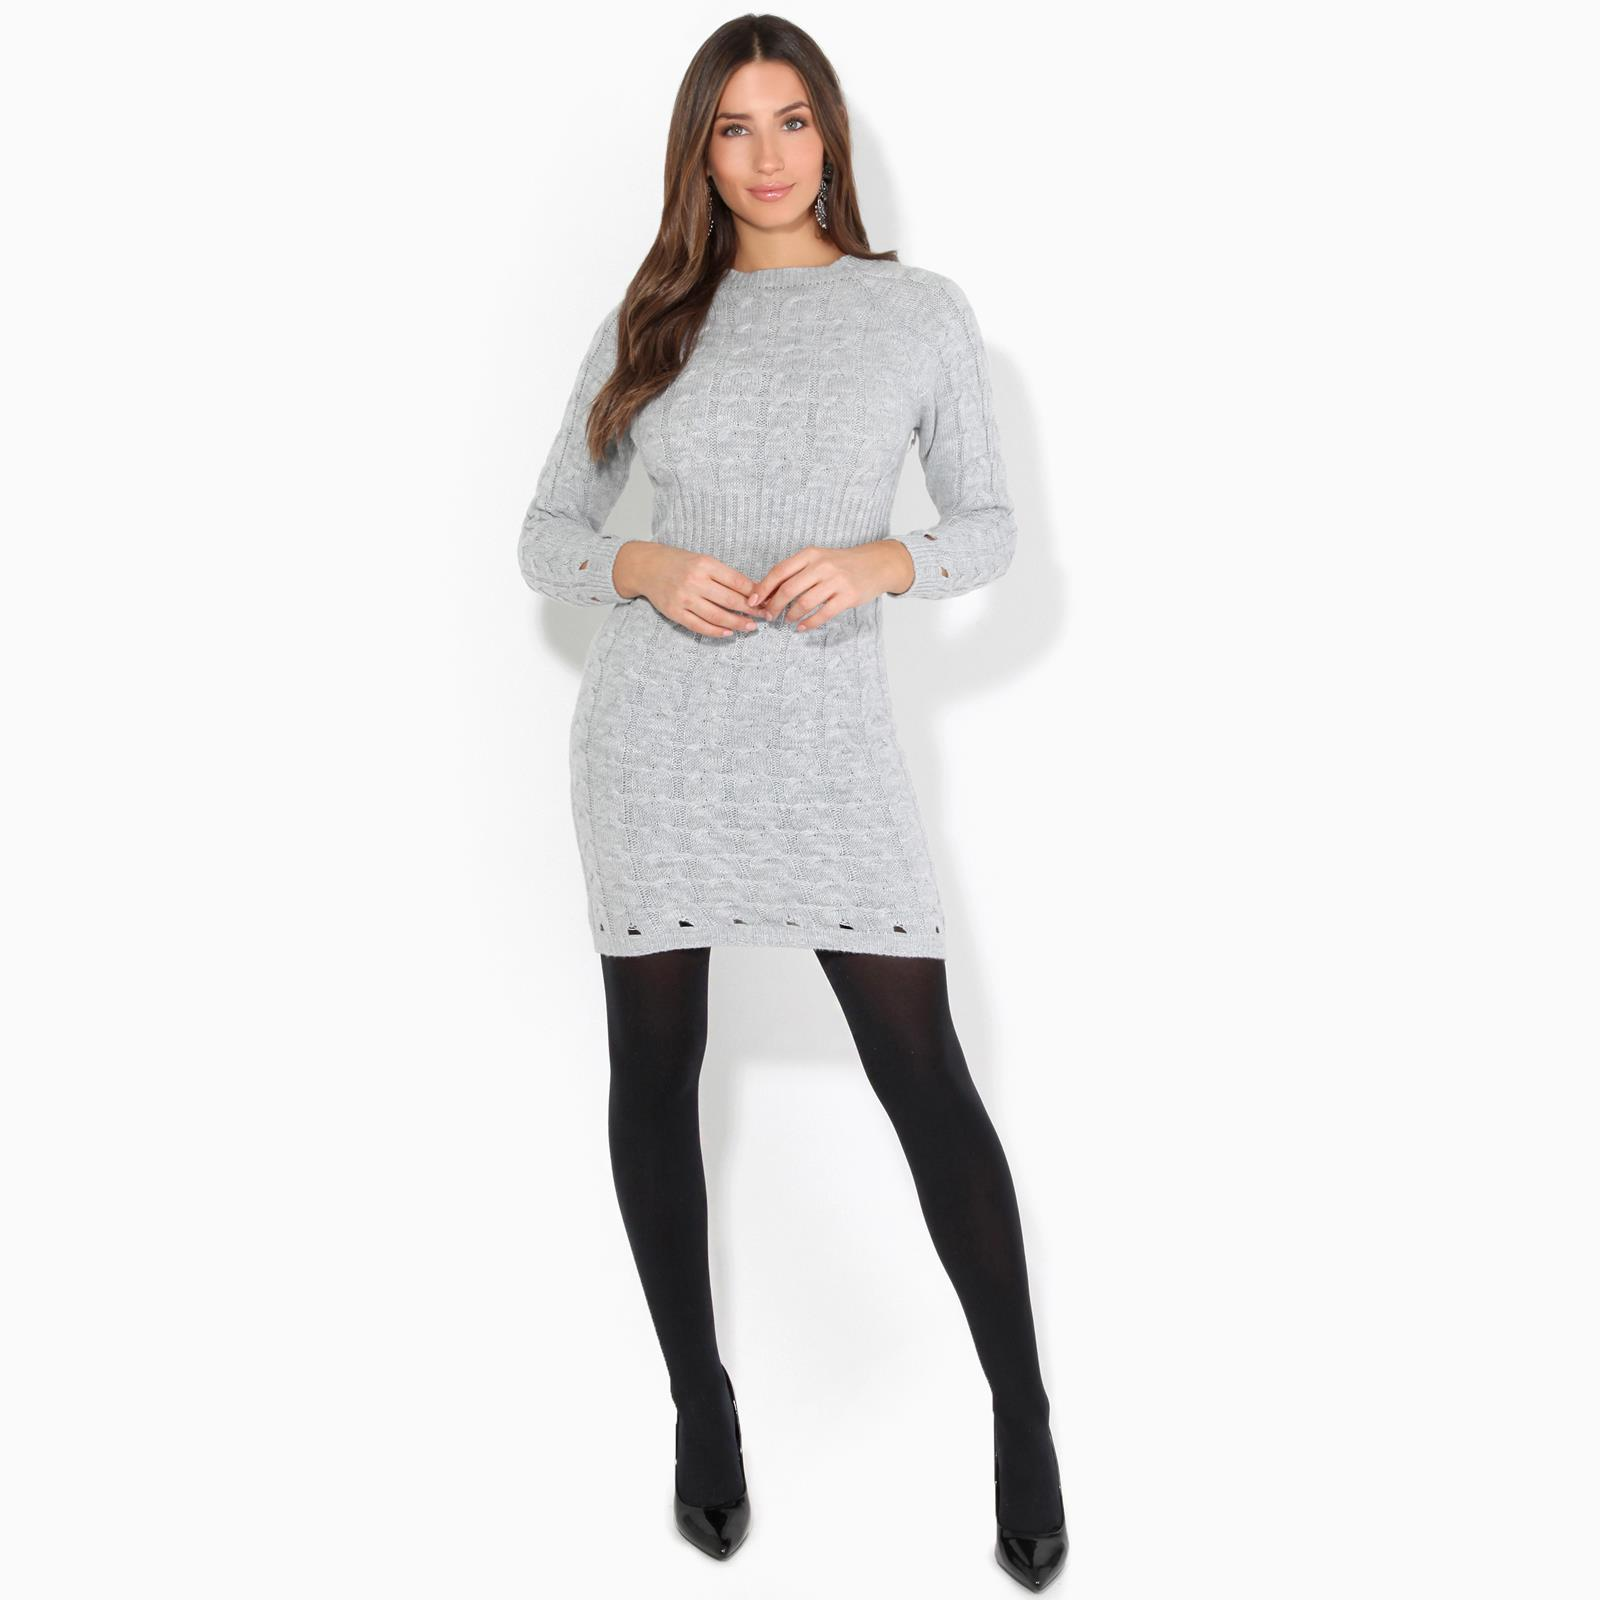 Womens-Ladies-Jumper-Dress-Longsleeve-Mini-Warm-Winter-Knit-Top-Bodycon thumbnail 12